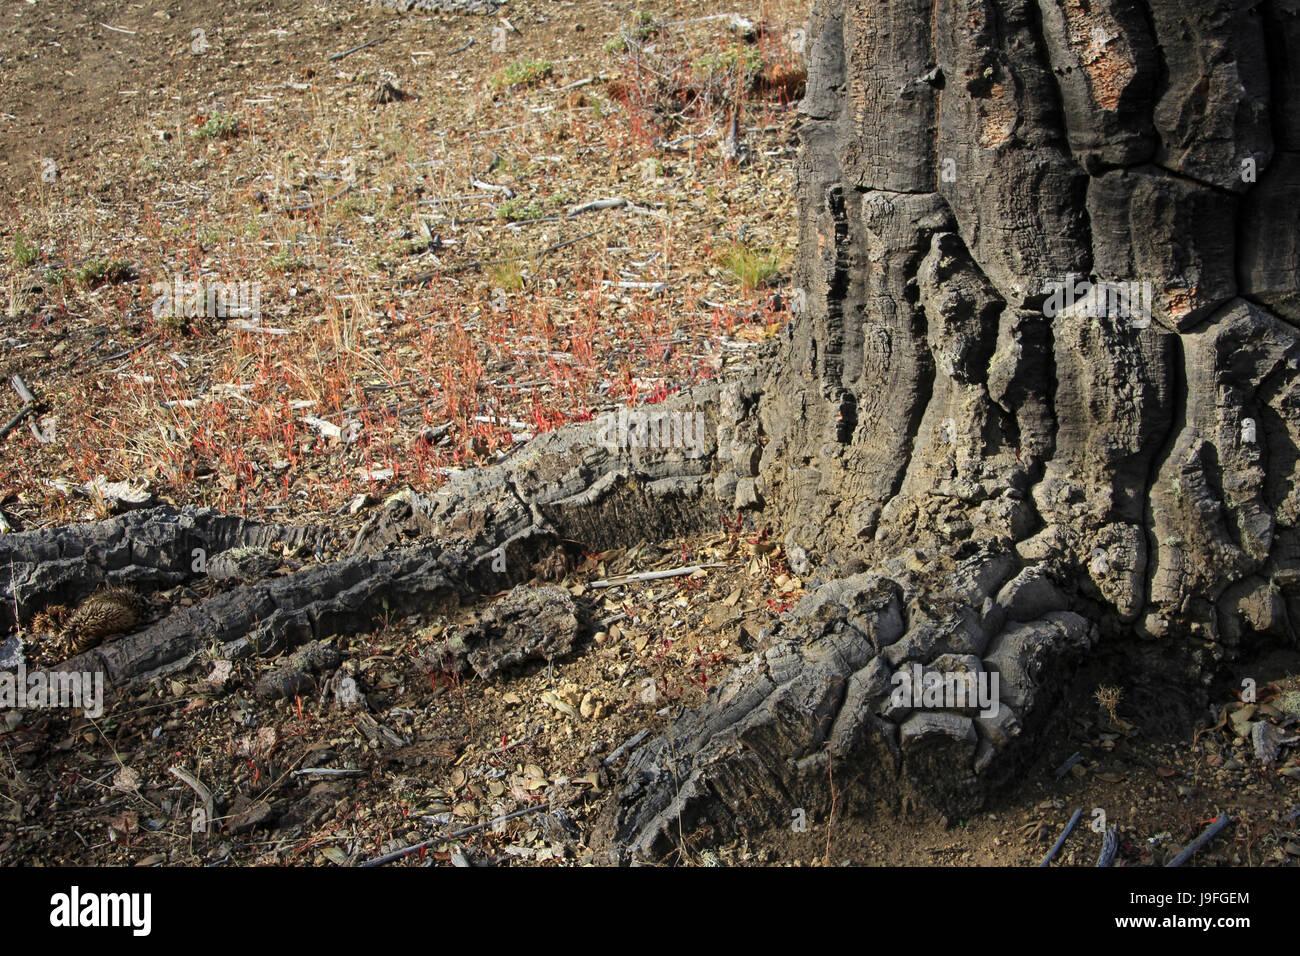 Araucaria, Monkey Puzzle Trees, forest near lake Alumine, Patagonia Argentina Stock Photo